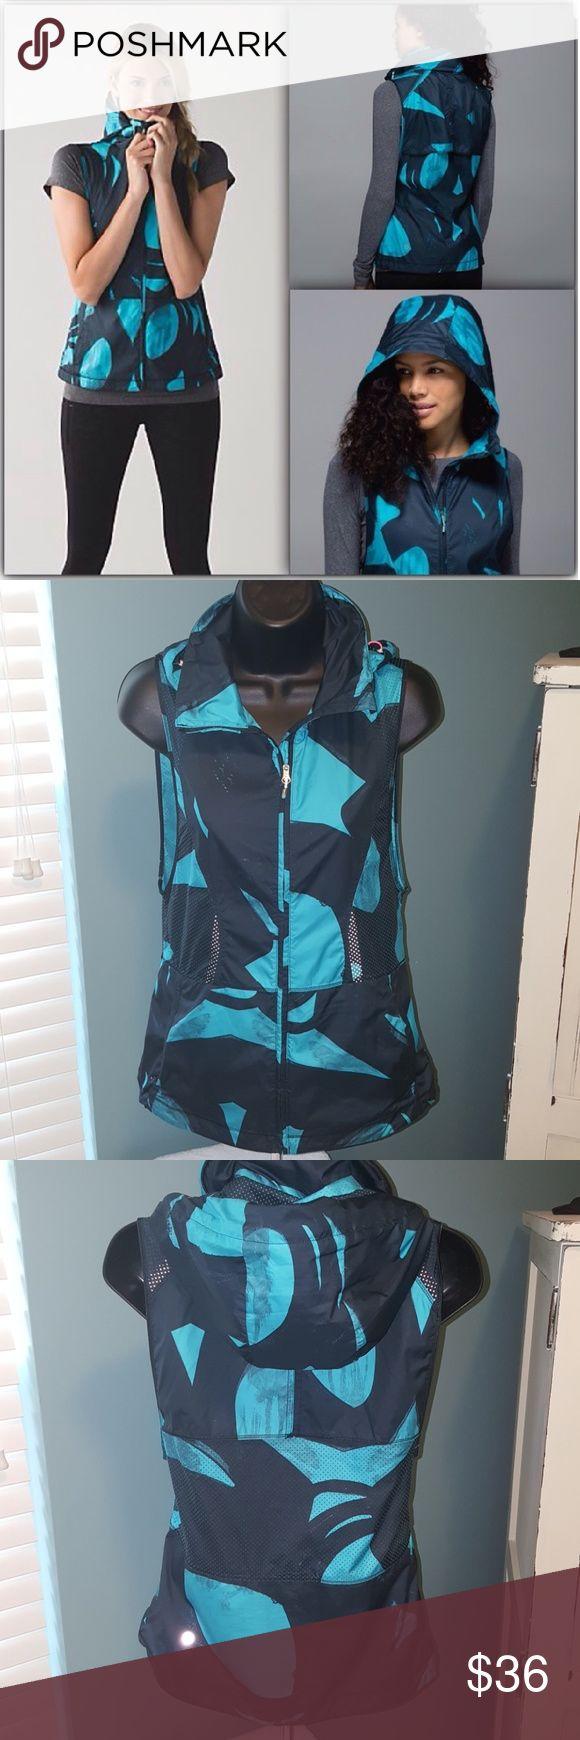 LULULEMON Pack it Vest 4 Lululemon vest, very lightweight and great for working out! Size 4, color is teal and black lululemon athletica Jackets & Coats Vests